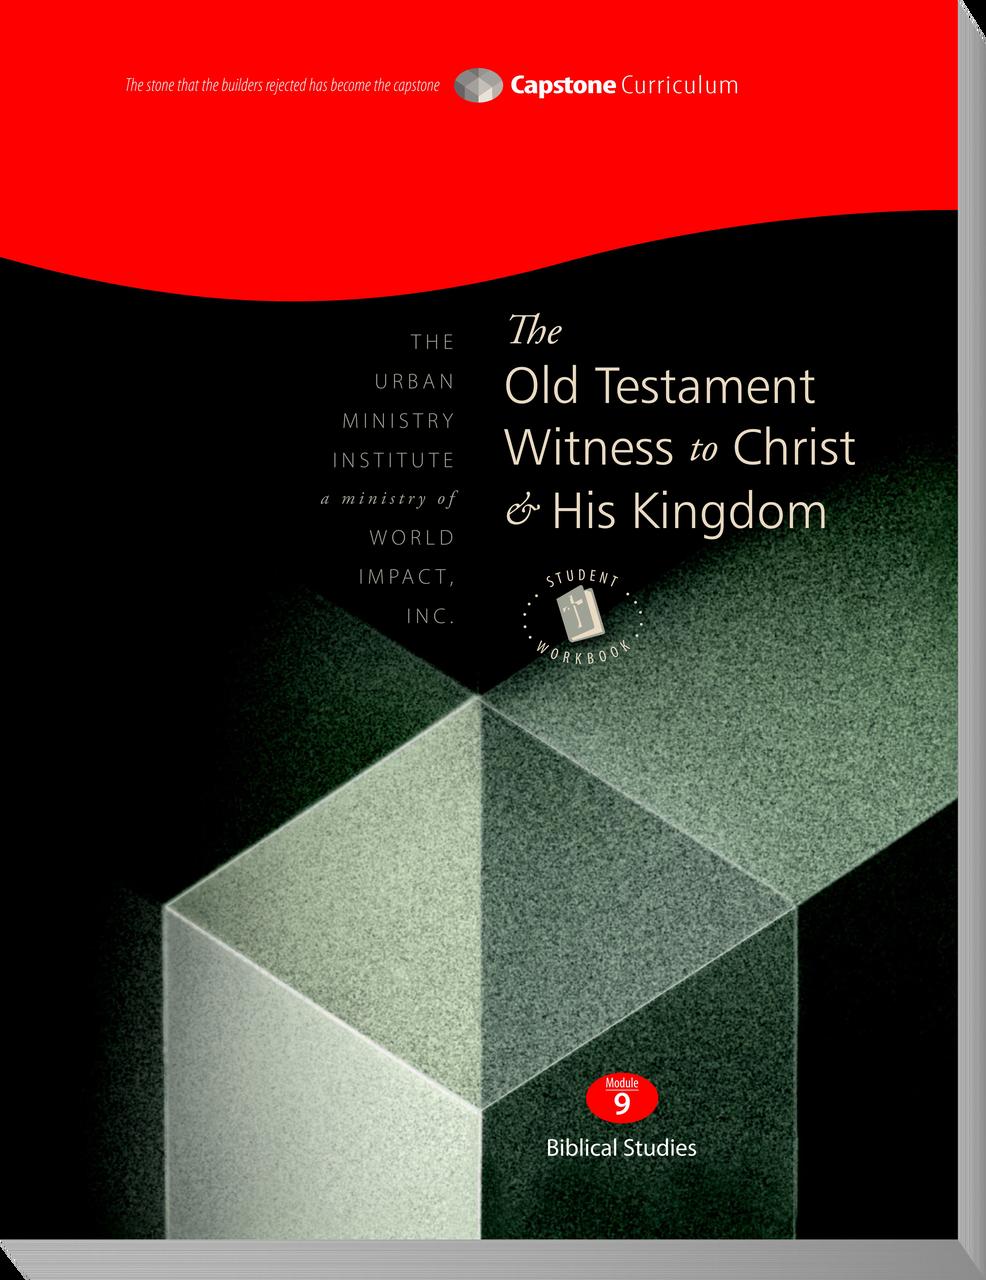 Old Testament Witness for Christ